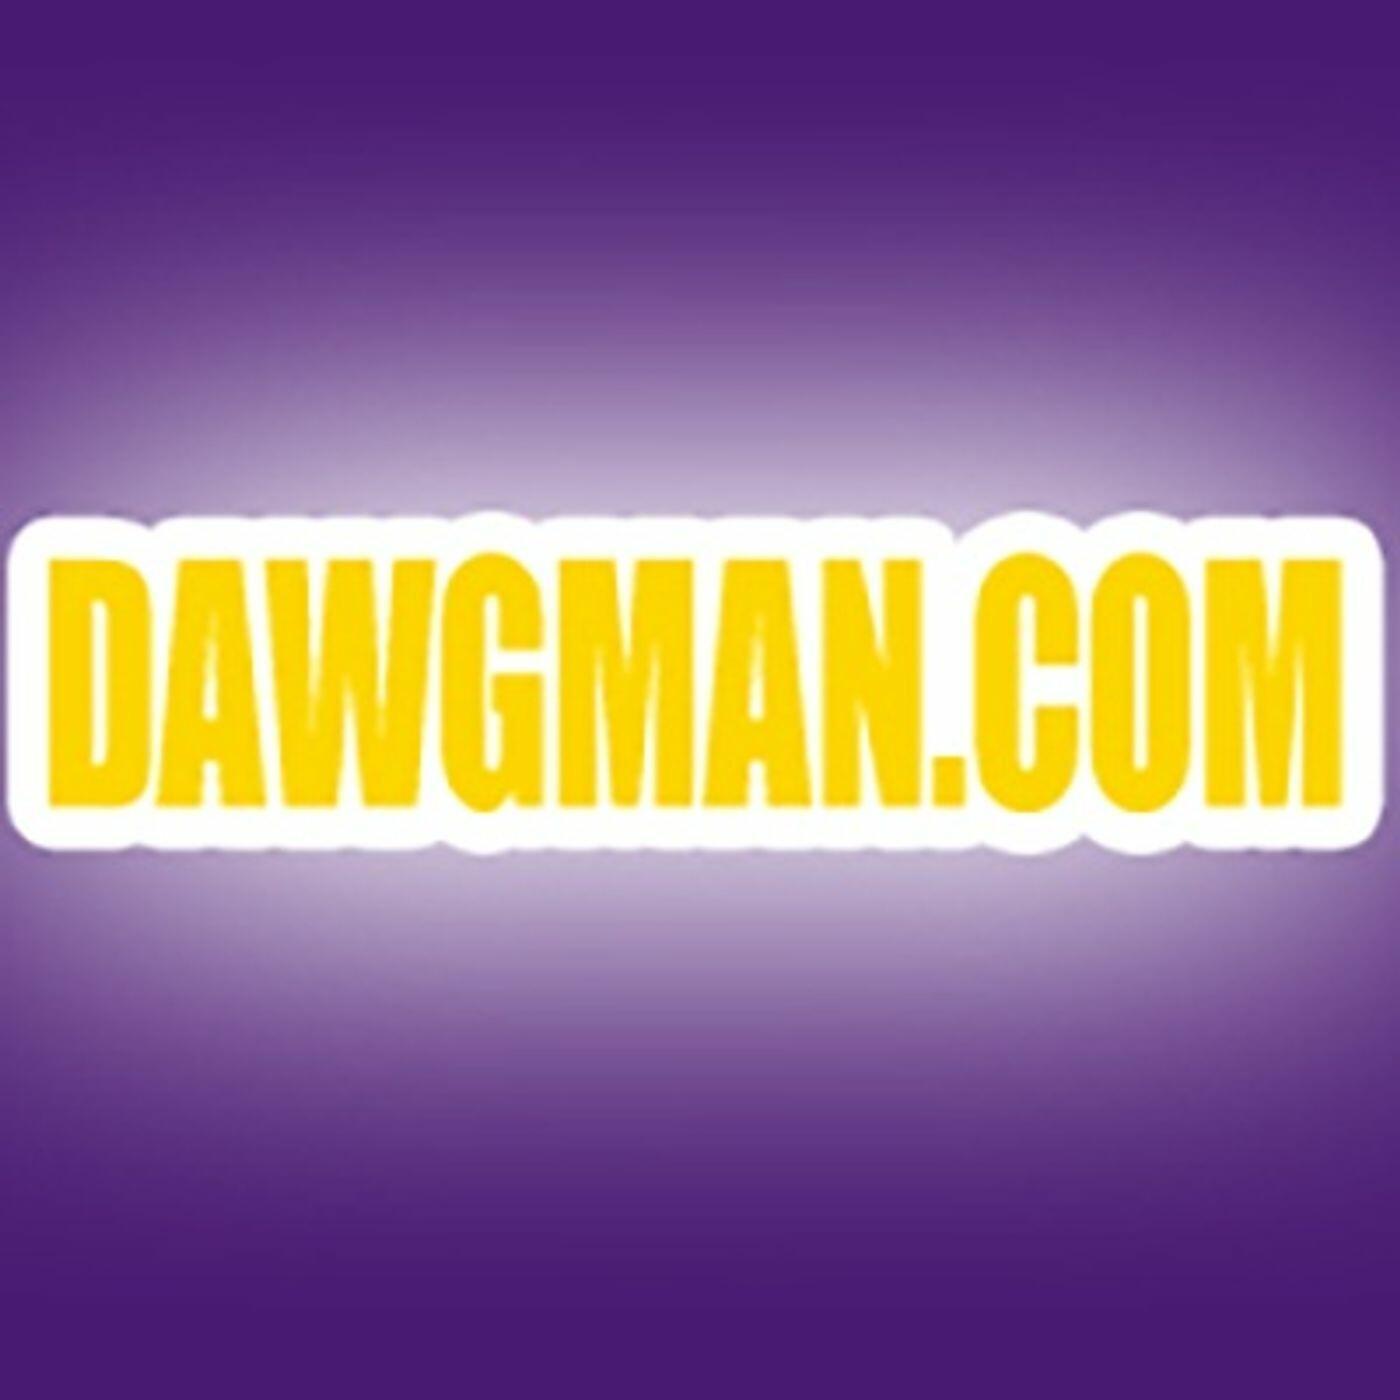 Dawgman.com On Demand